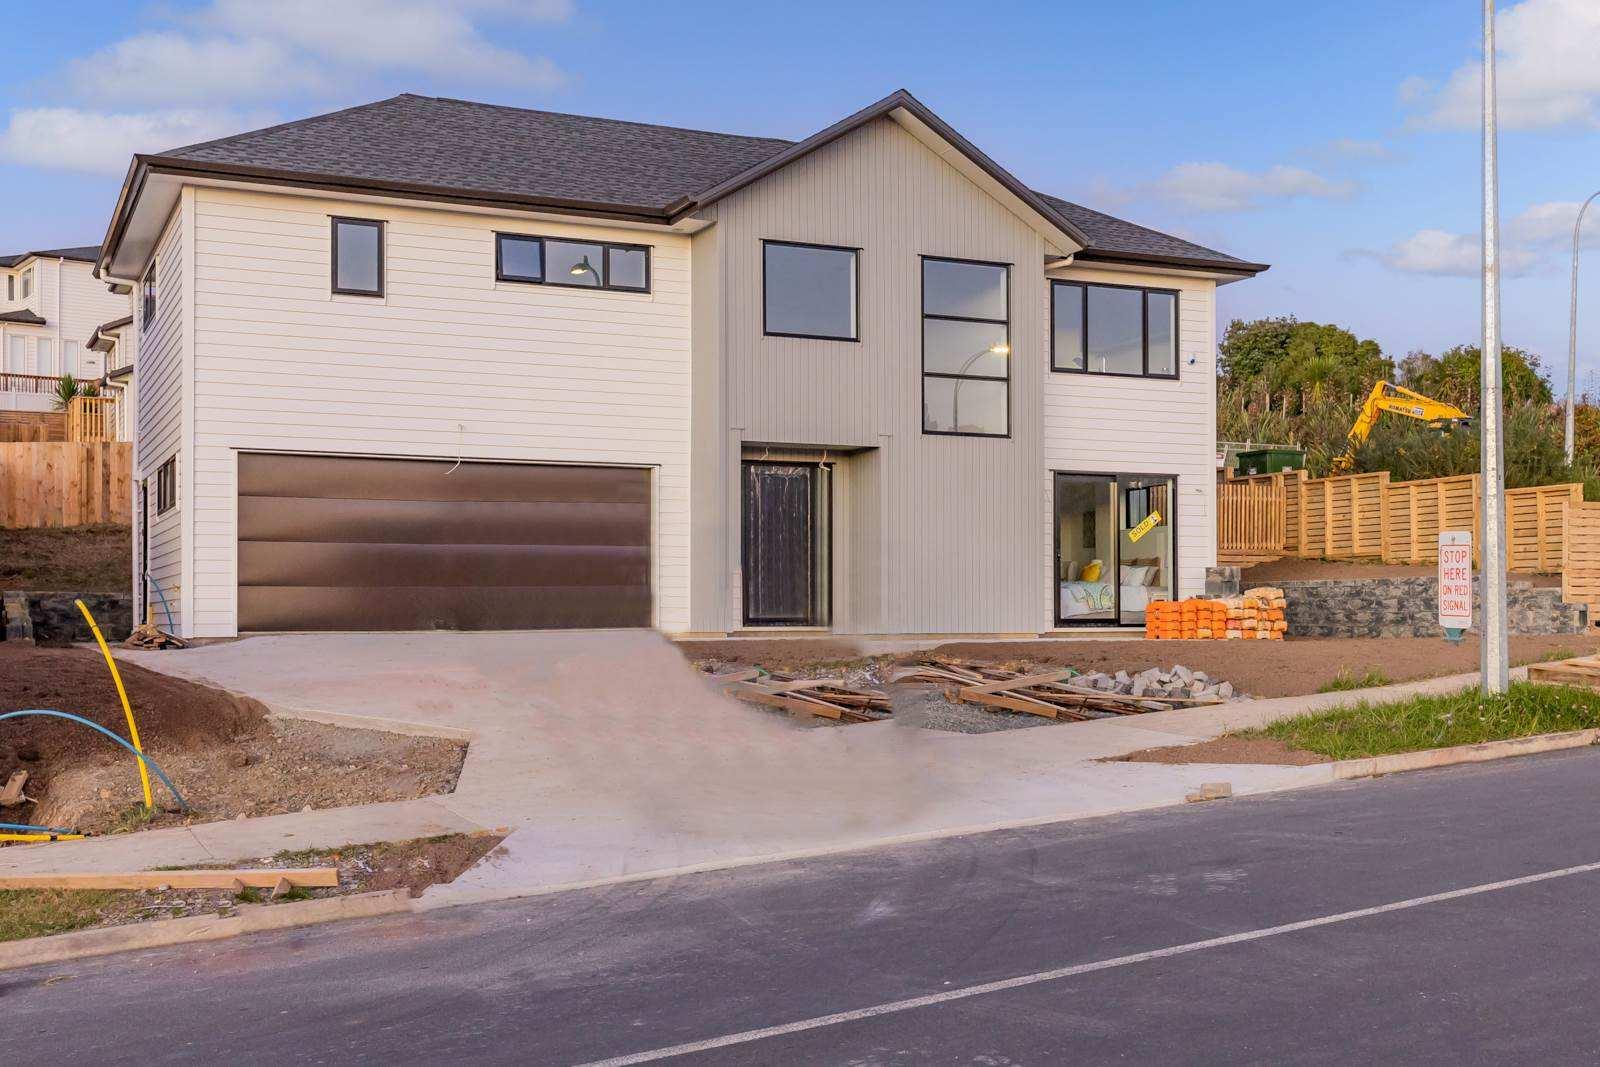 Orewa 4房 全新双层舒居 地理位置优越 10年建商质保 优享品质配套 周边好校云集 海滩近距离 易上高速 即刻开启美好生活! Great Price - Corner Section - Sun & View!